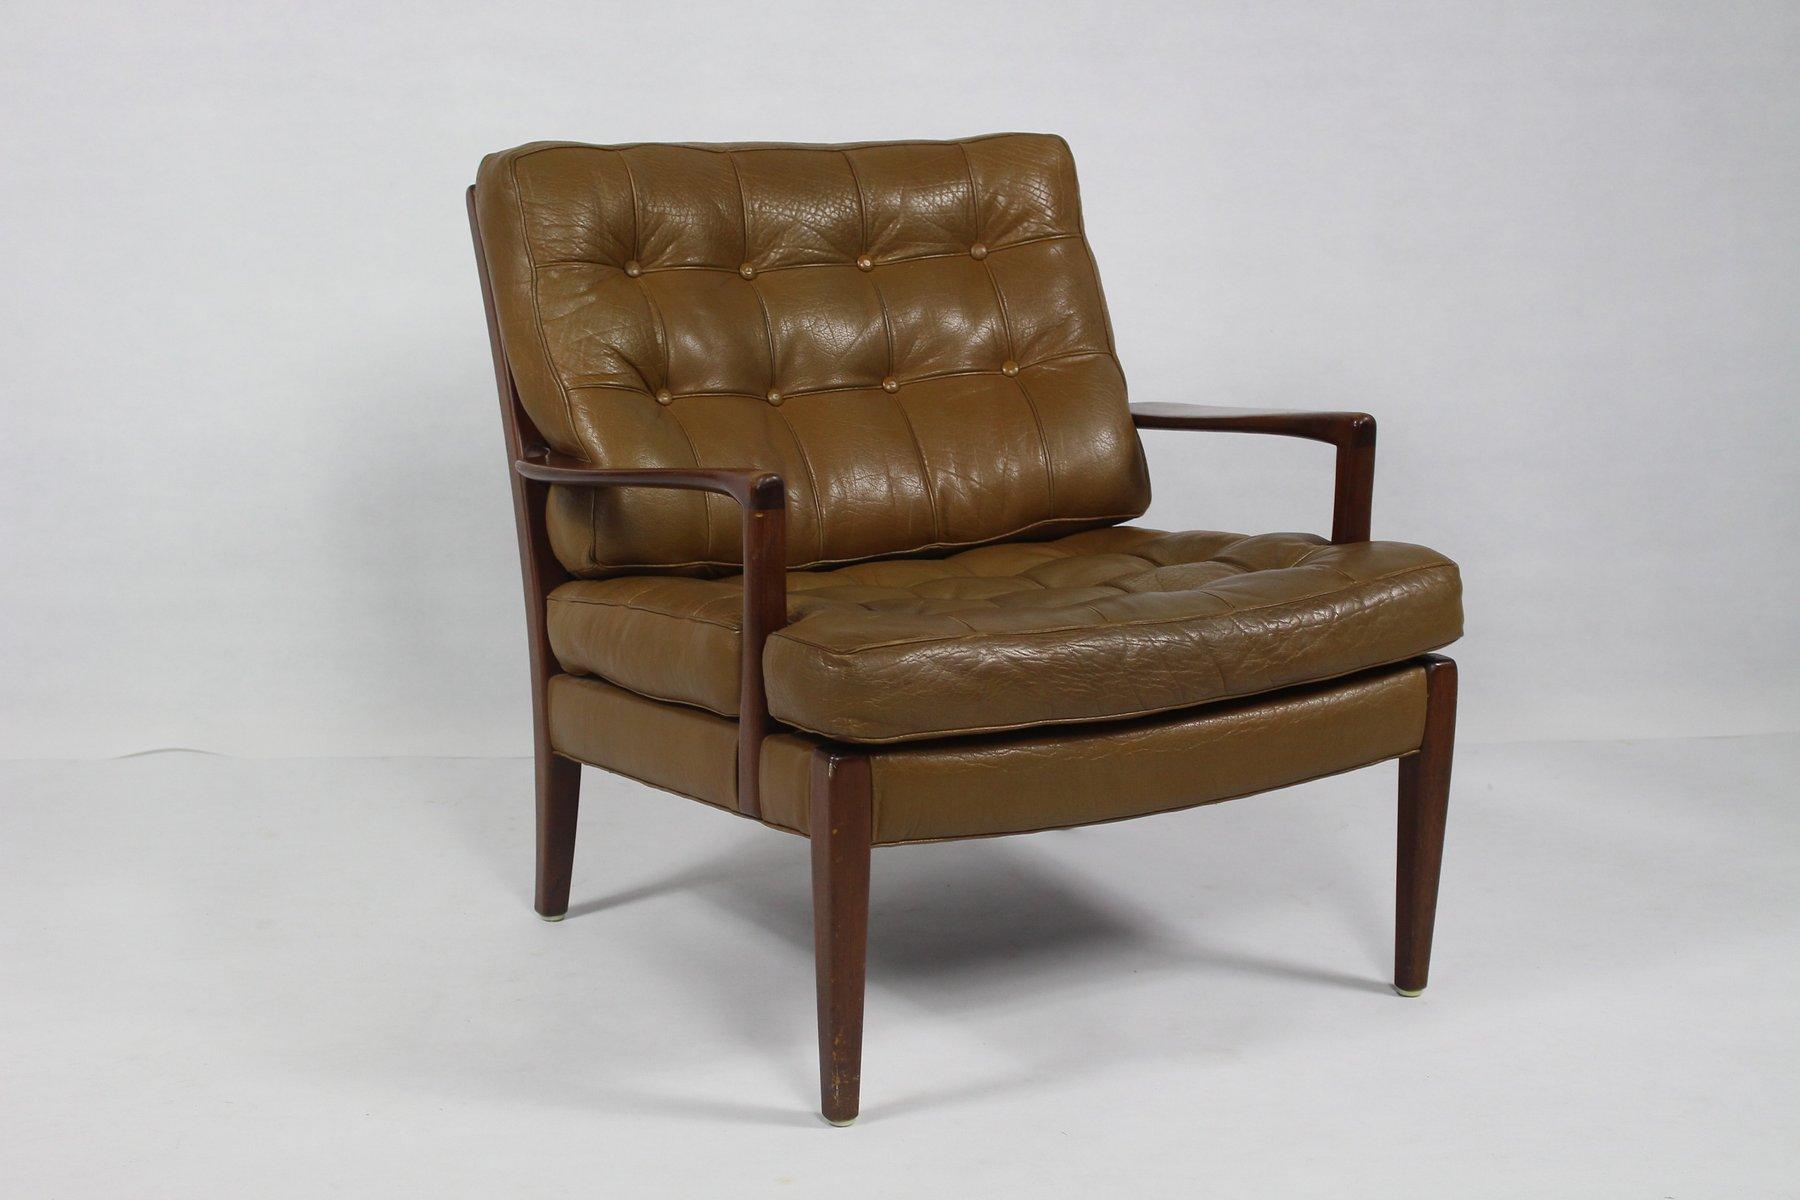 Vintage Lo?ven Sessel von Arne Norell